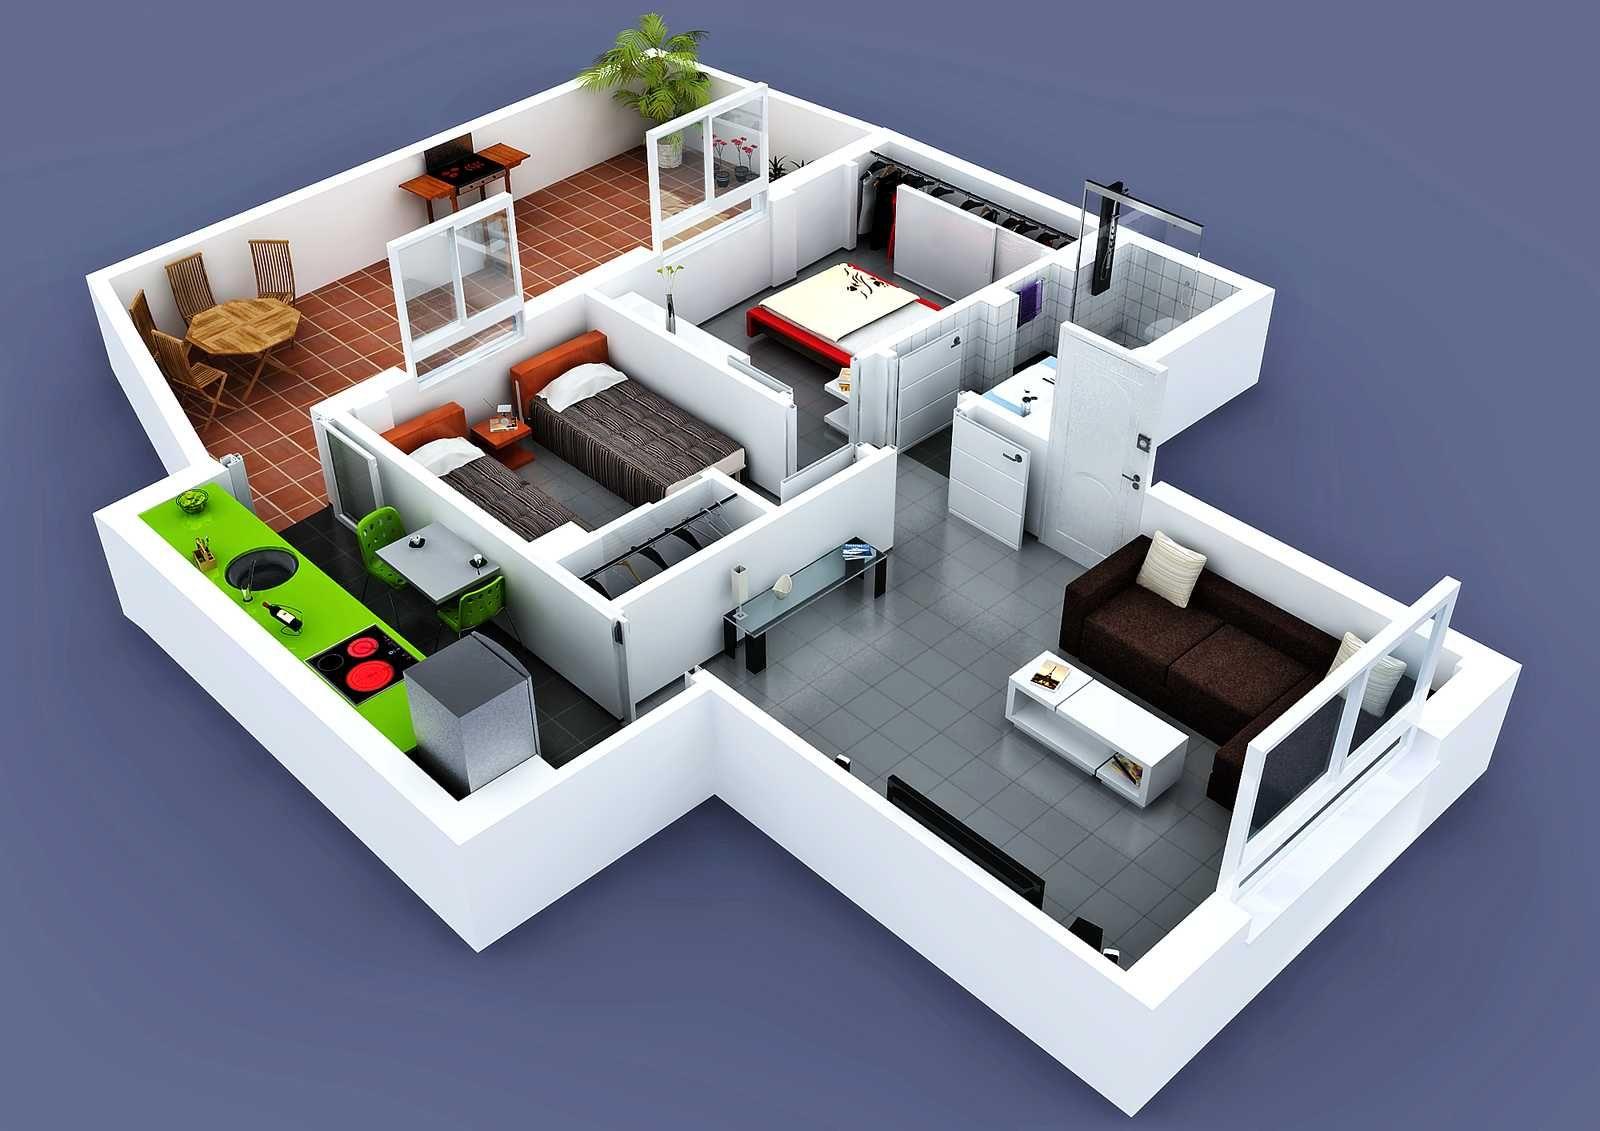 Planos 3d casas buscar con google la casa de mis for Planos de casas pequenas en 3d